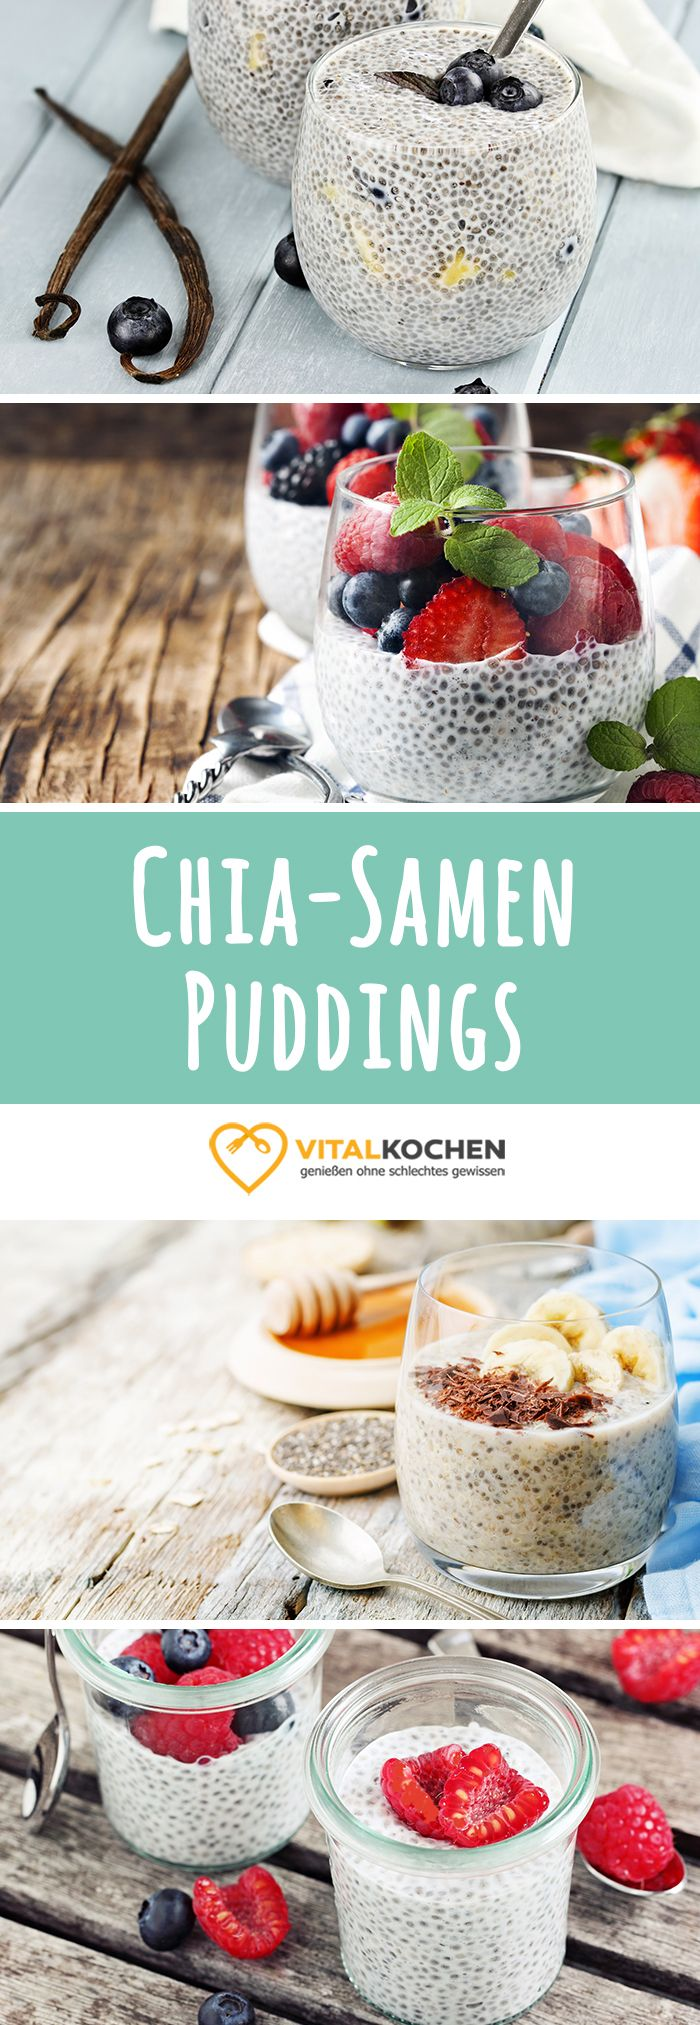 Chia Samen Rezepte - Vegane Chia Samen Puddings, Smoothie Bowls und Shakes